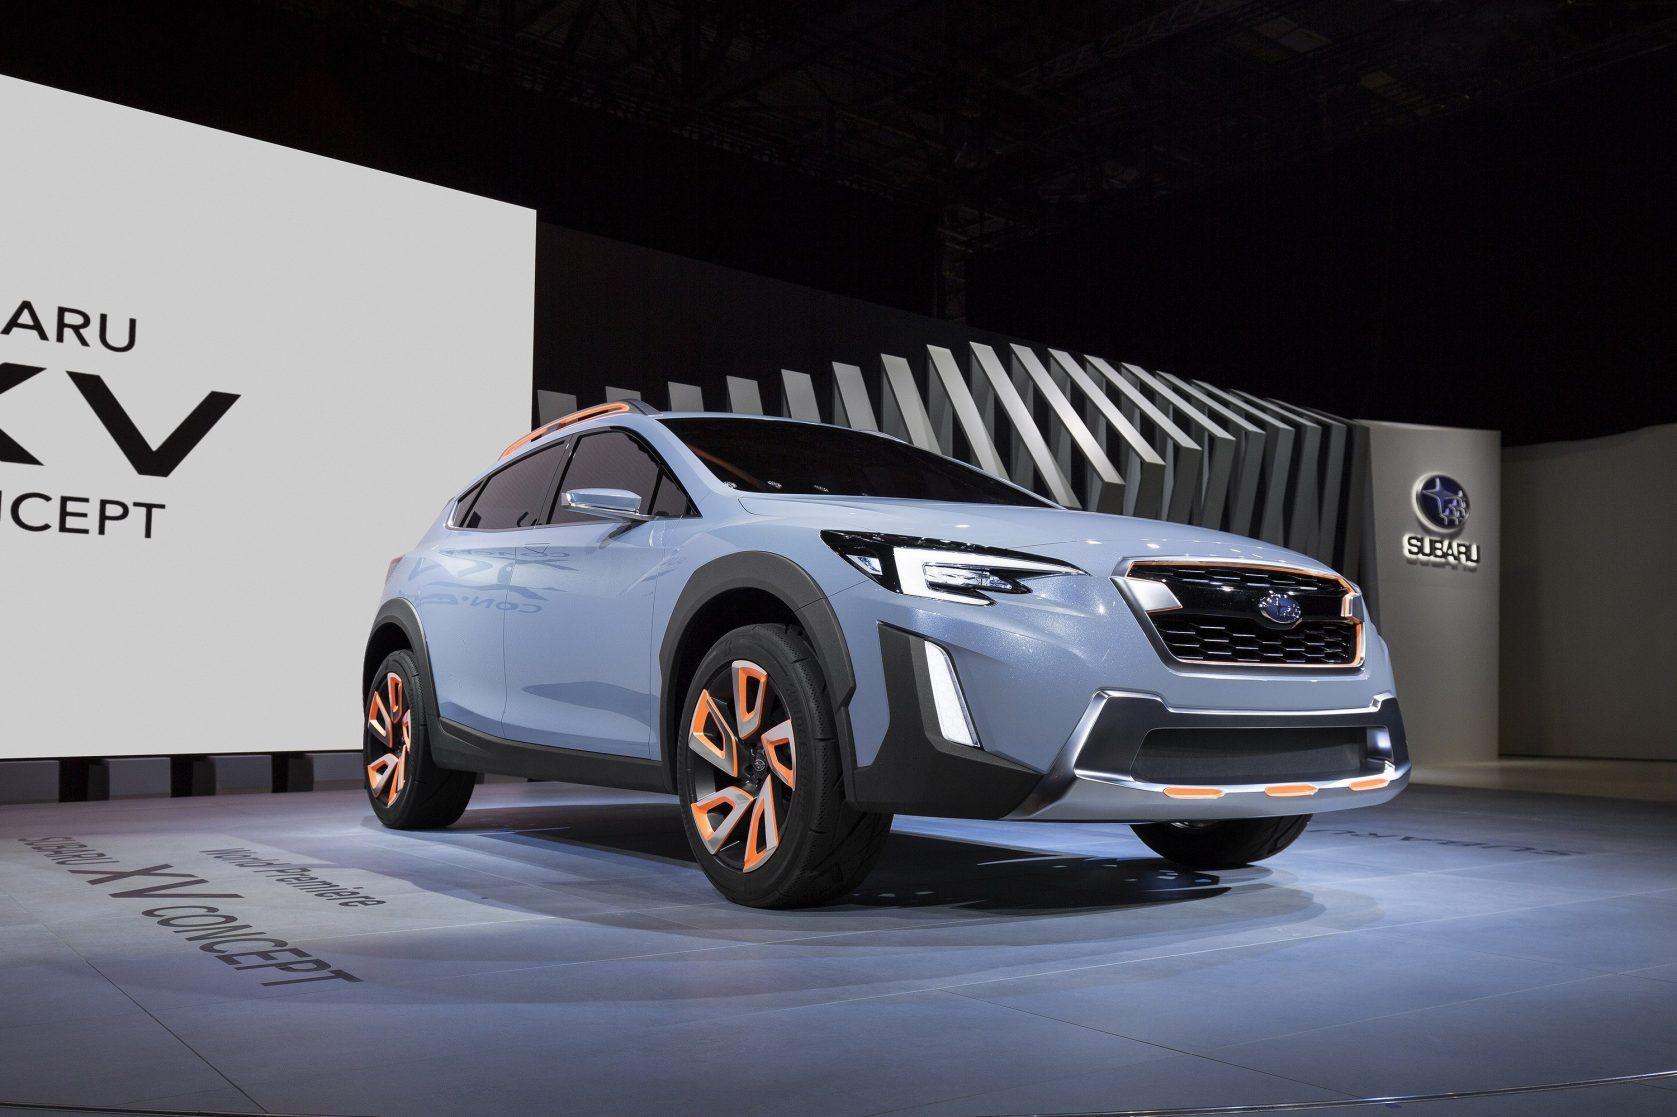 2019 Subaru Crosstrek Hybrid Ev Driving Range Listed By Carb Subaru Crosstrek Subaru Subaru Impreza